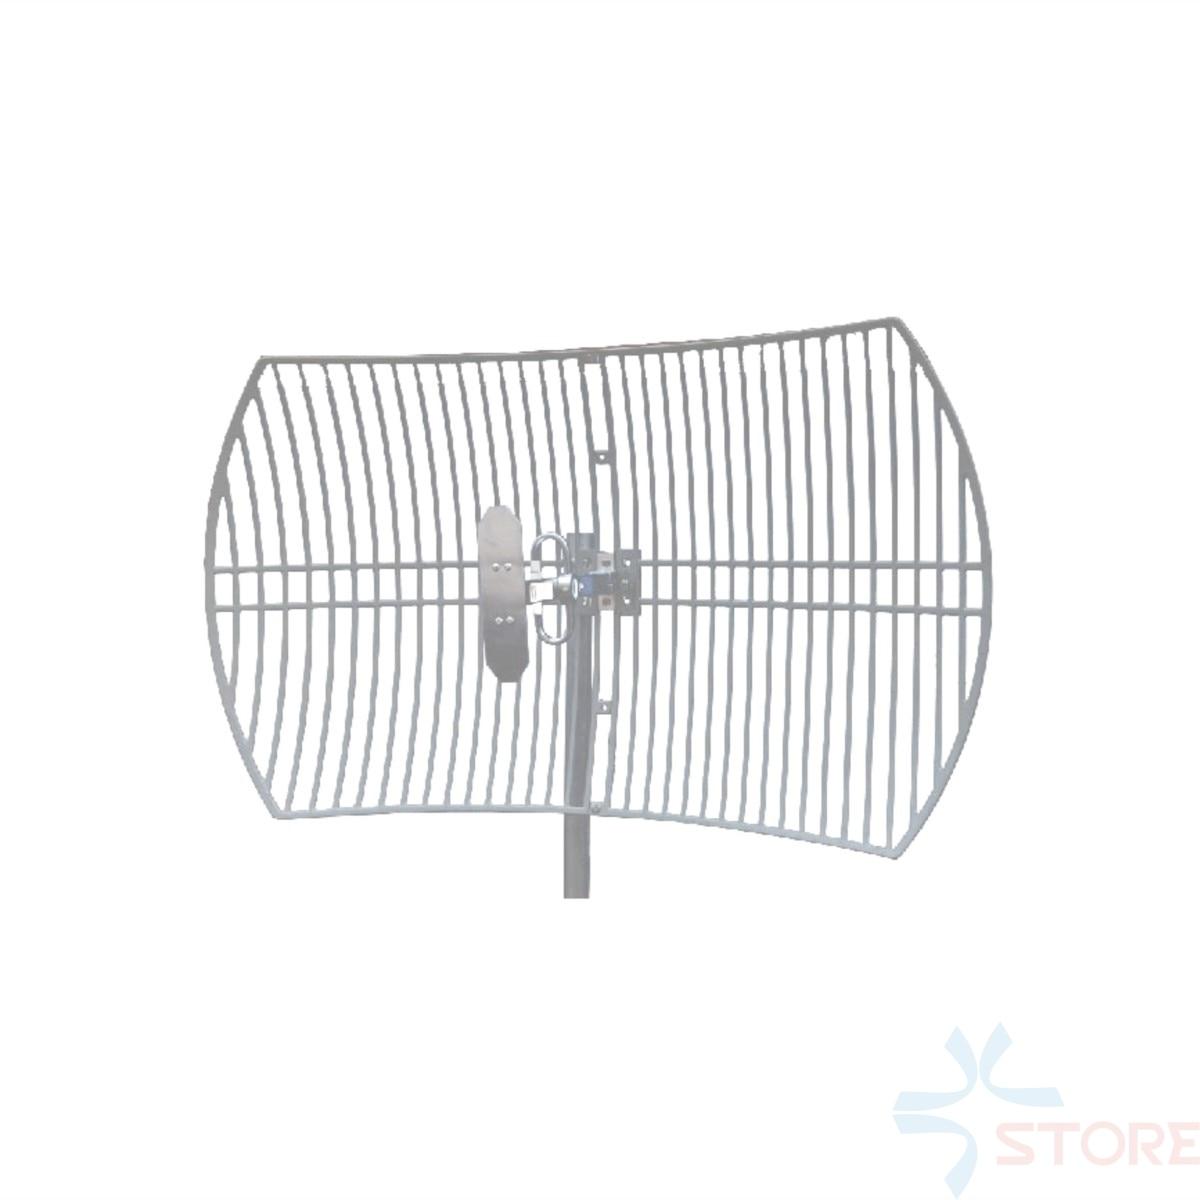 900MHz 15dBi High Gain GSM Directional Parabolic Grid Antenna For UHF CUAV Data Transmission Radio Data Modem